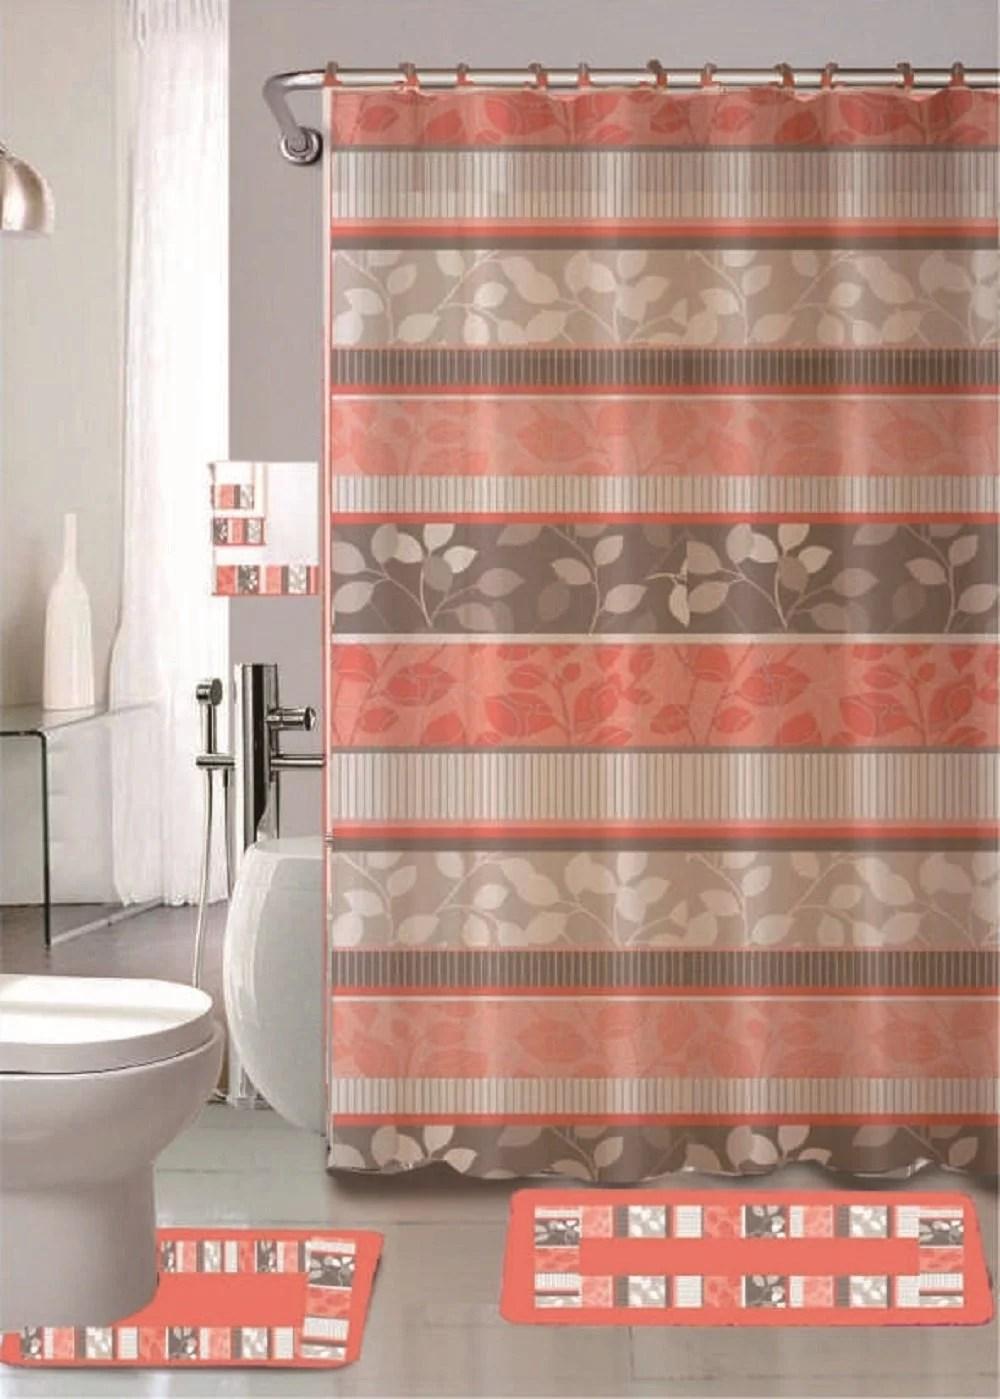 zen peach 18 piece bathroom set 2 rugs mats 1 fabric shower curtain 12 fabric covered rings 3 pc decorative towel set